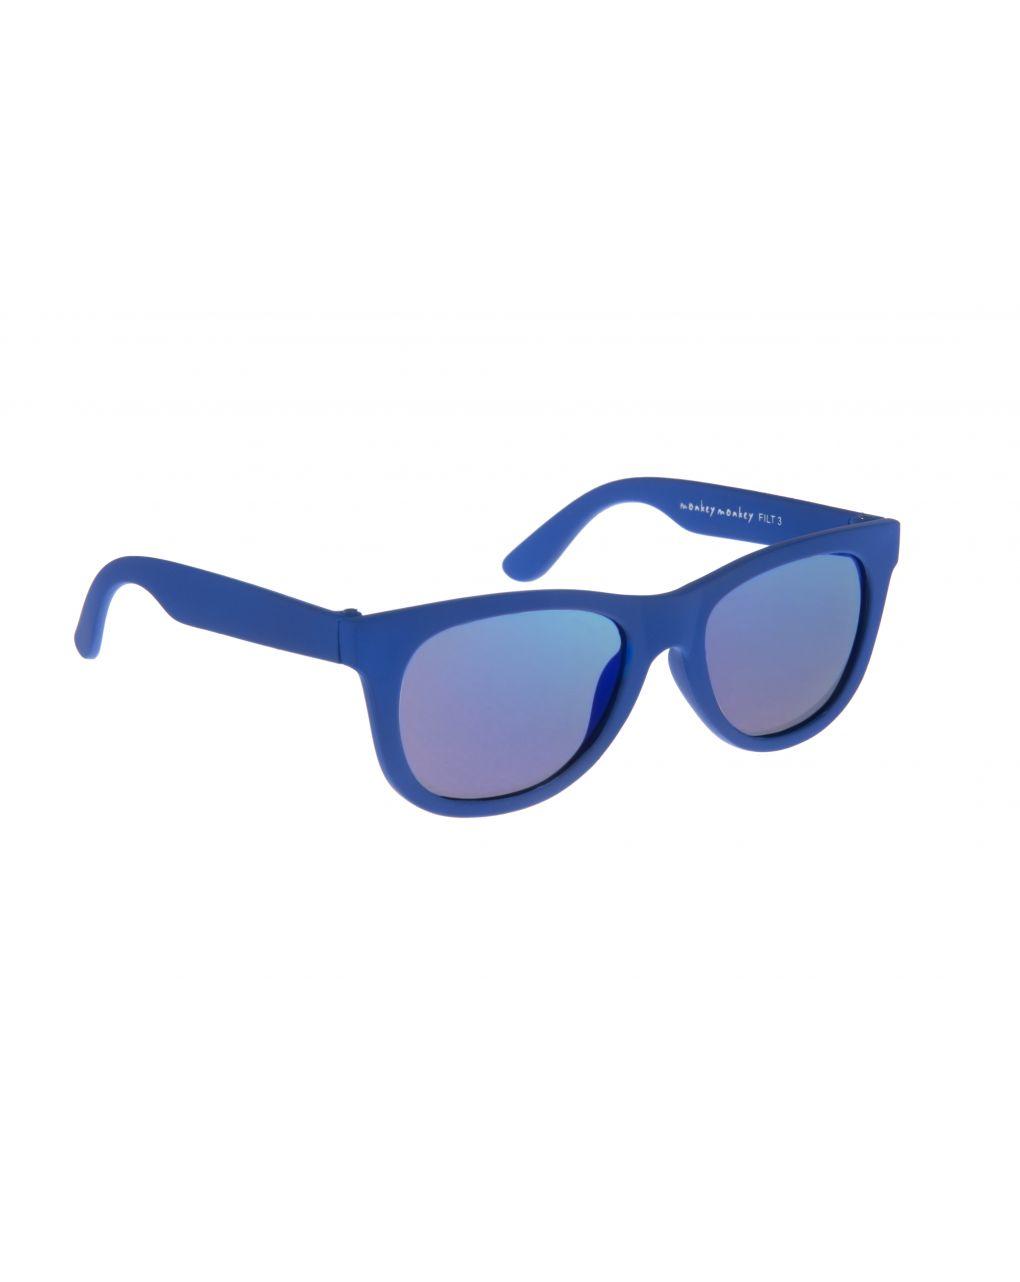 Prenatal Παιδικά Γυαλιά Ηλίου - Μπλε